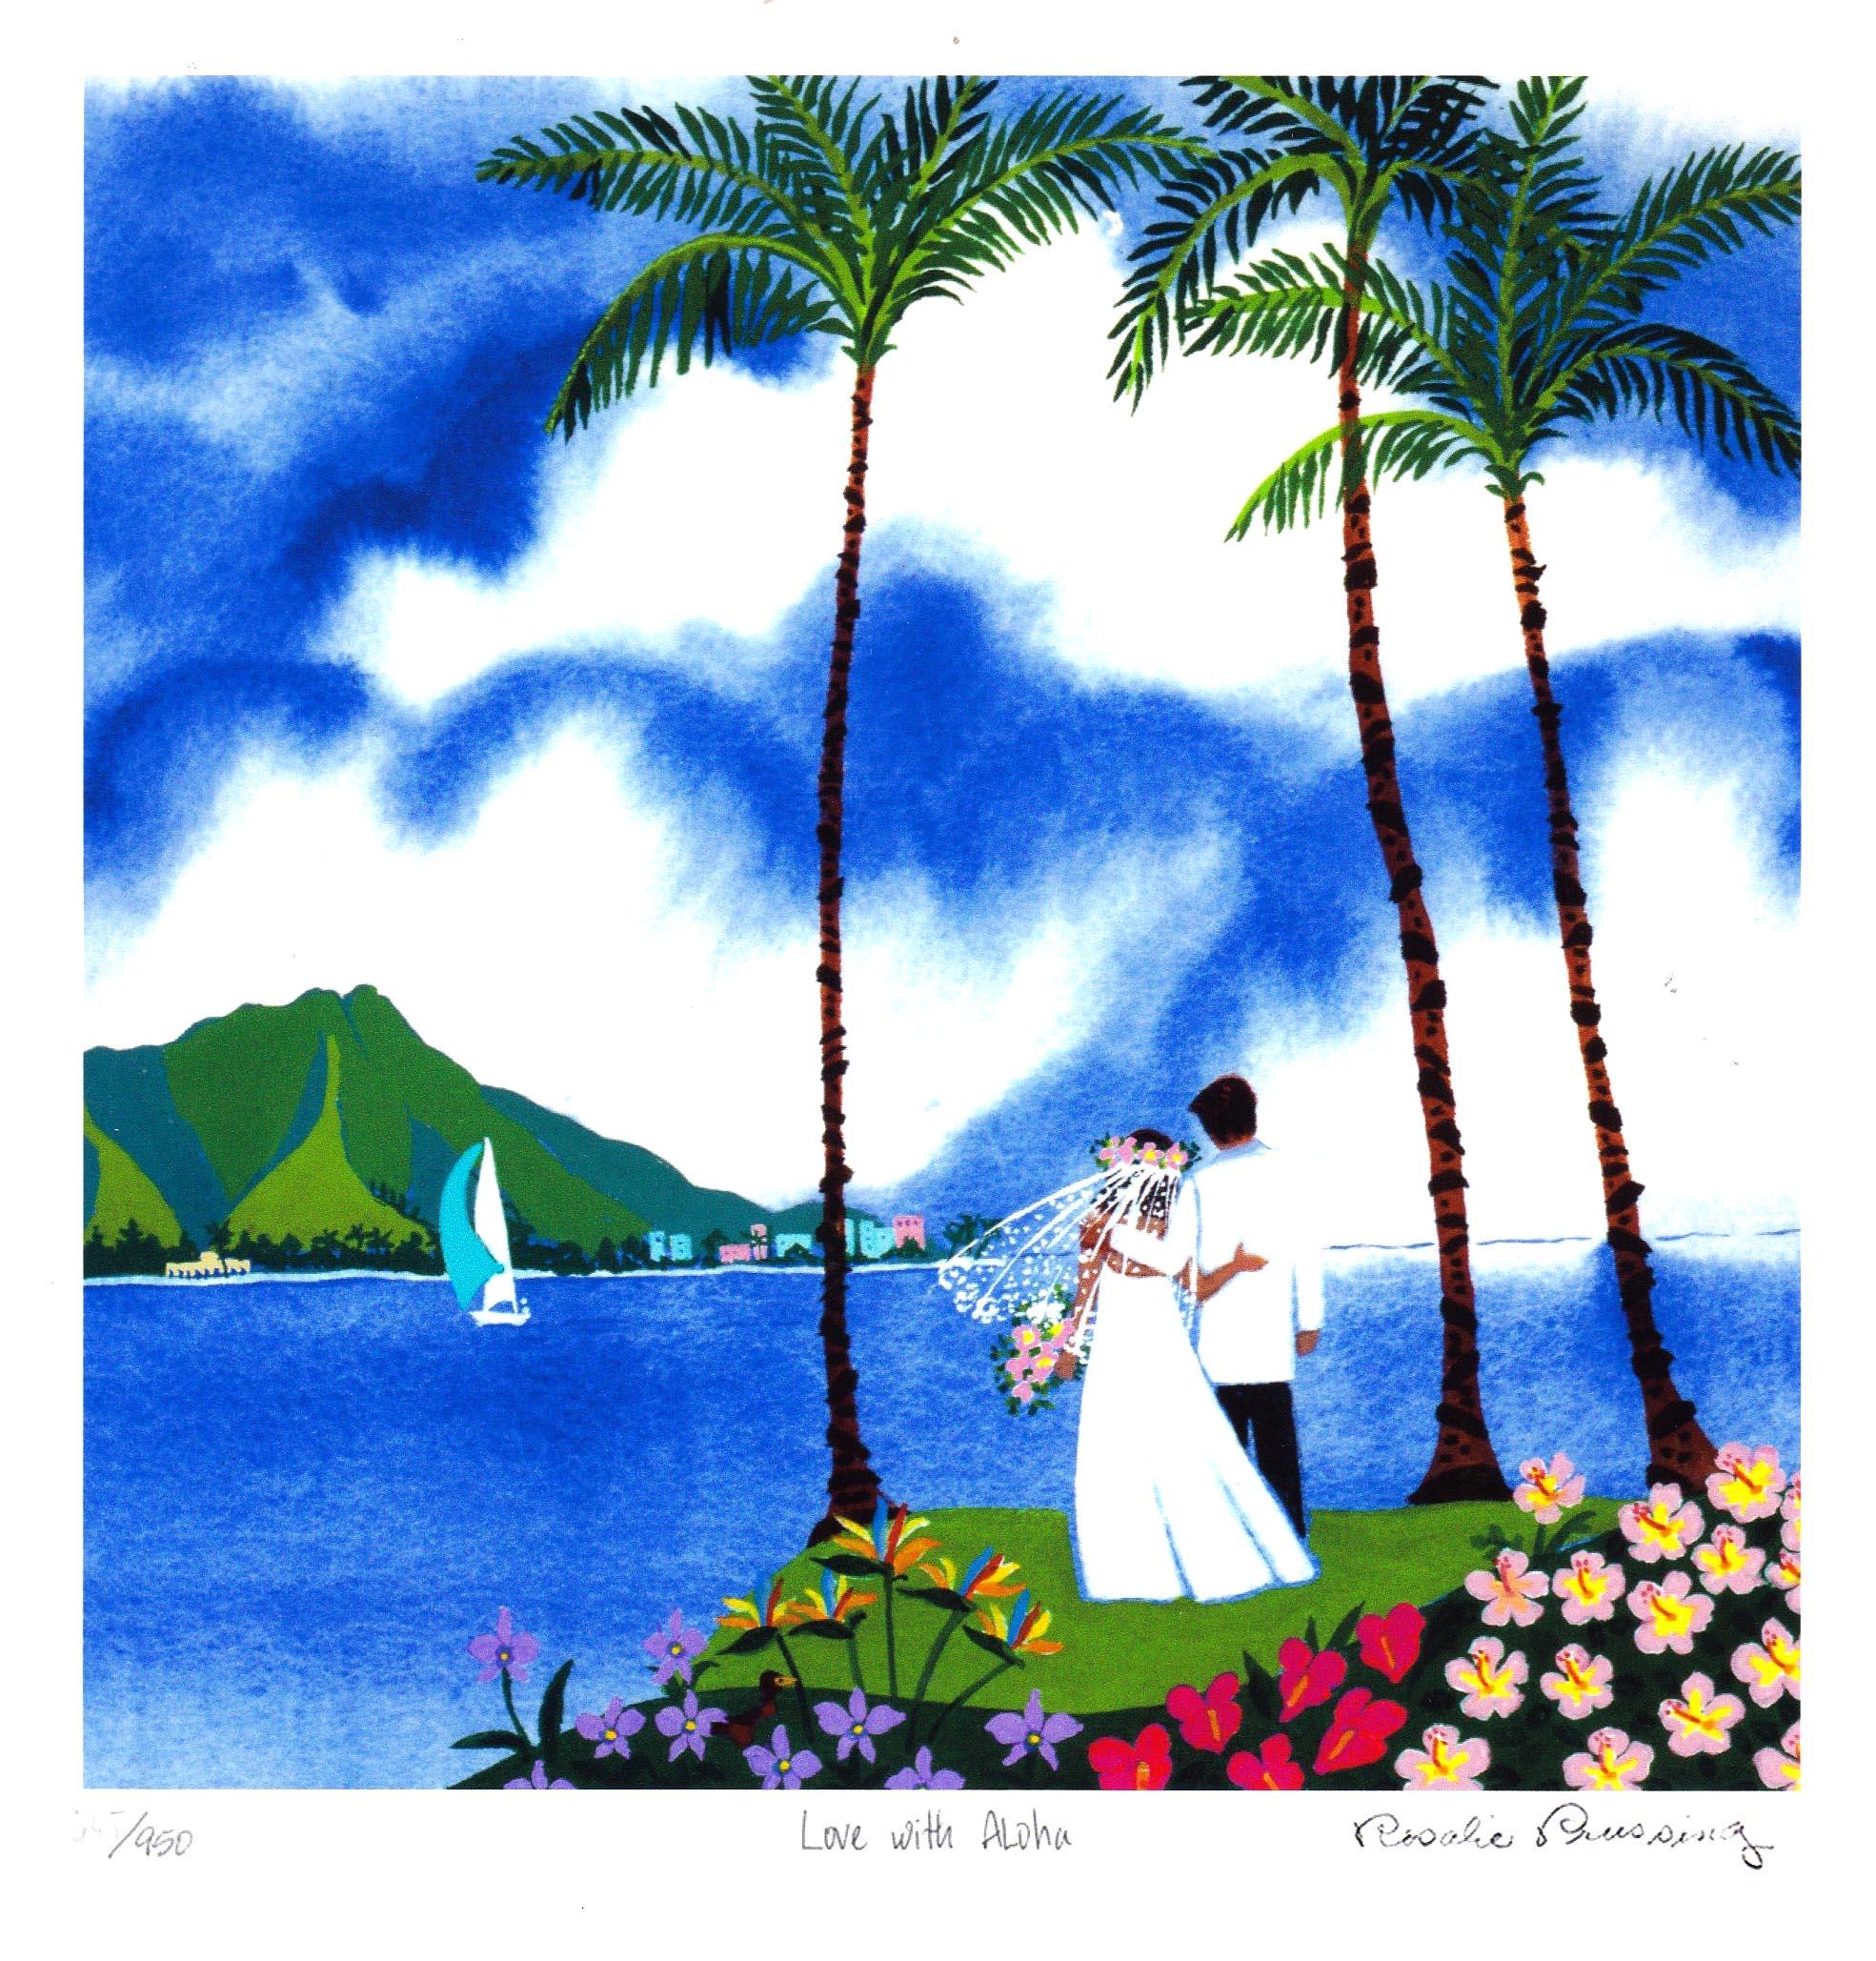 Love with Aloha